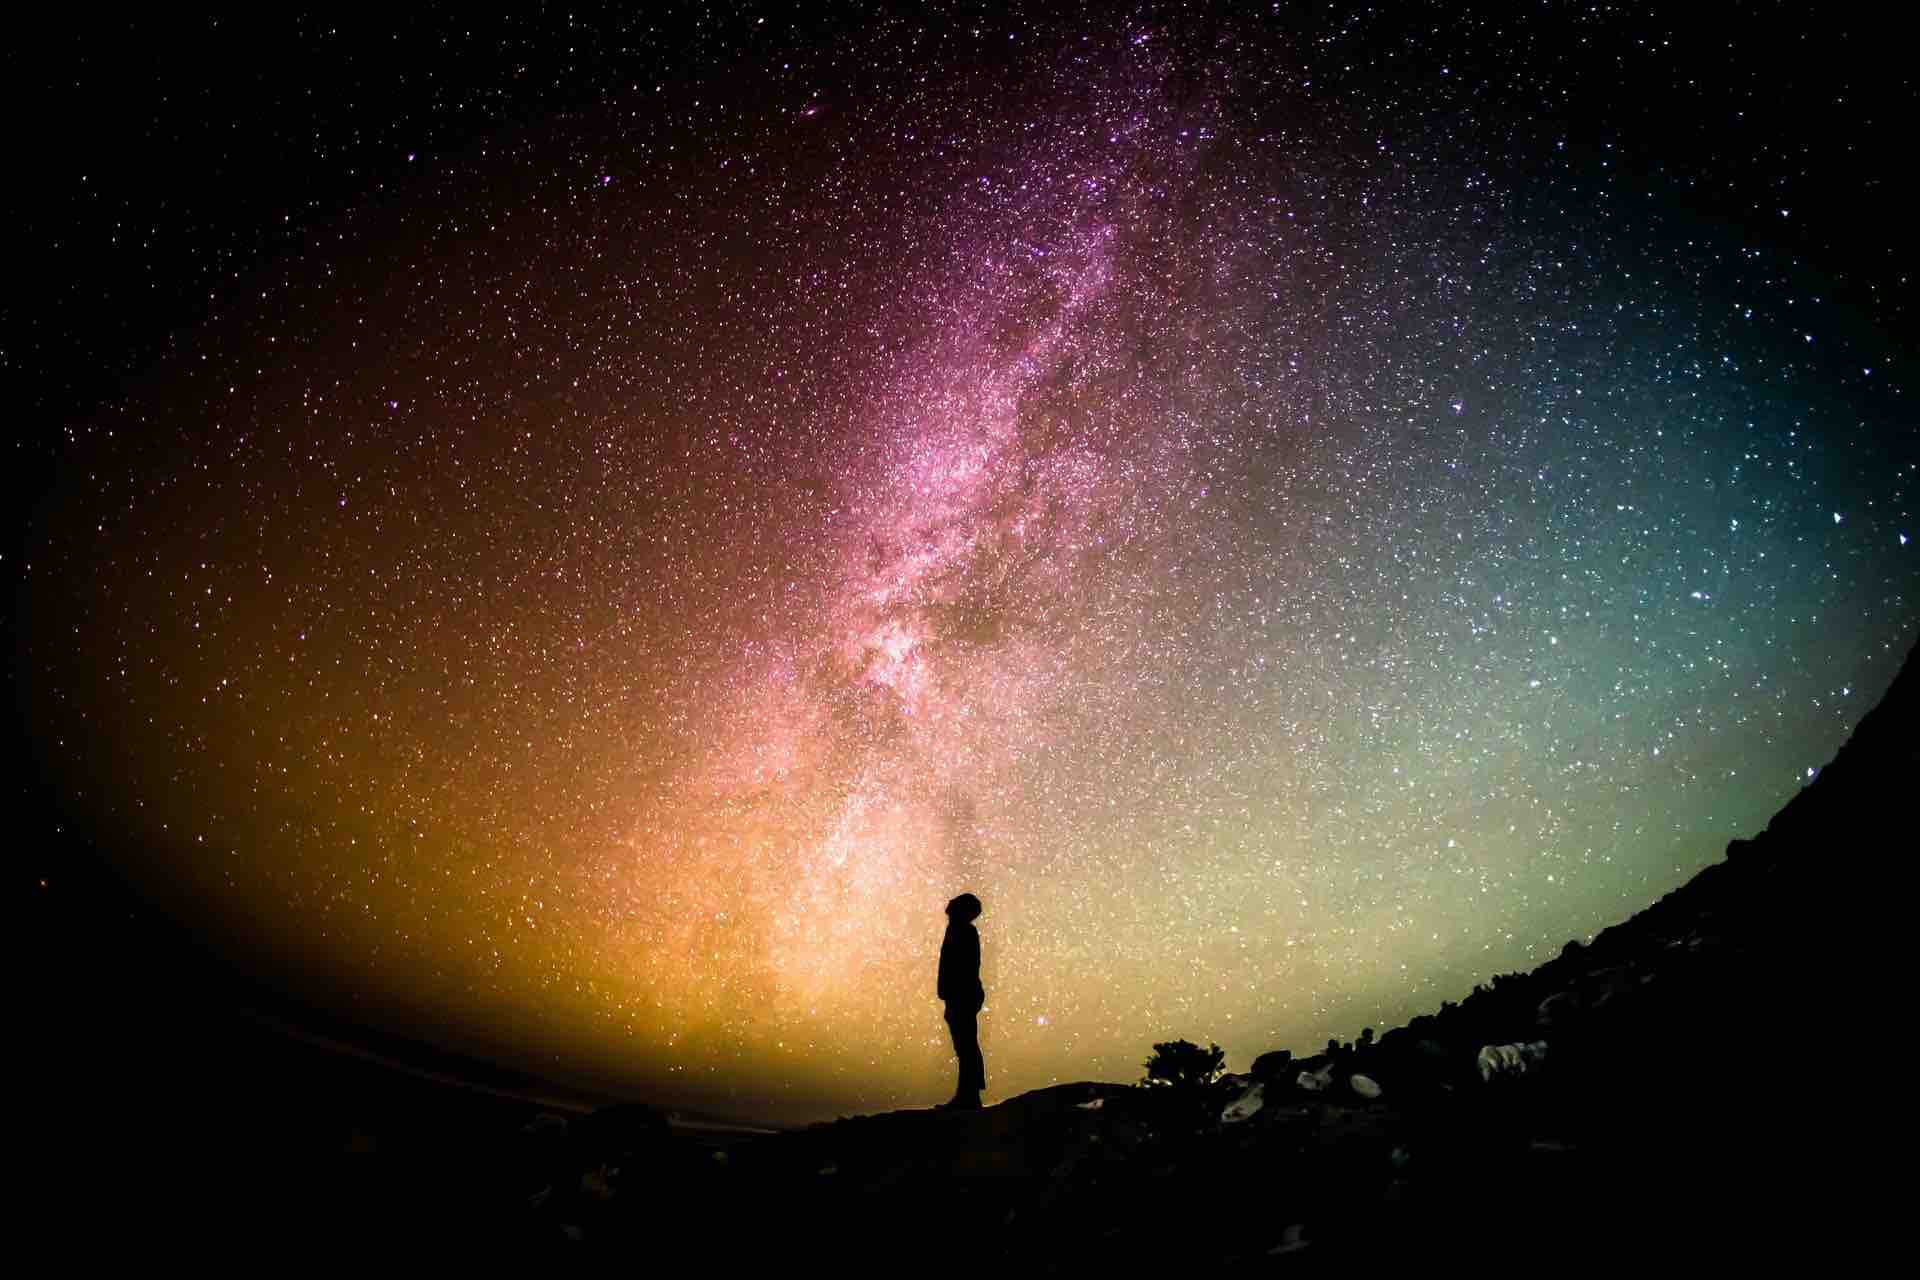 étoiles seul solitude ciel nuit galaxie